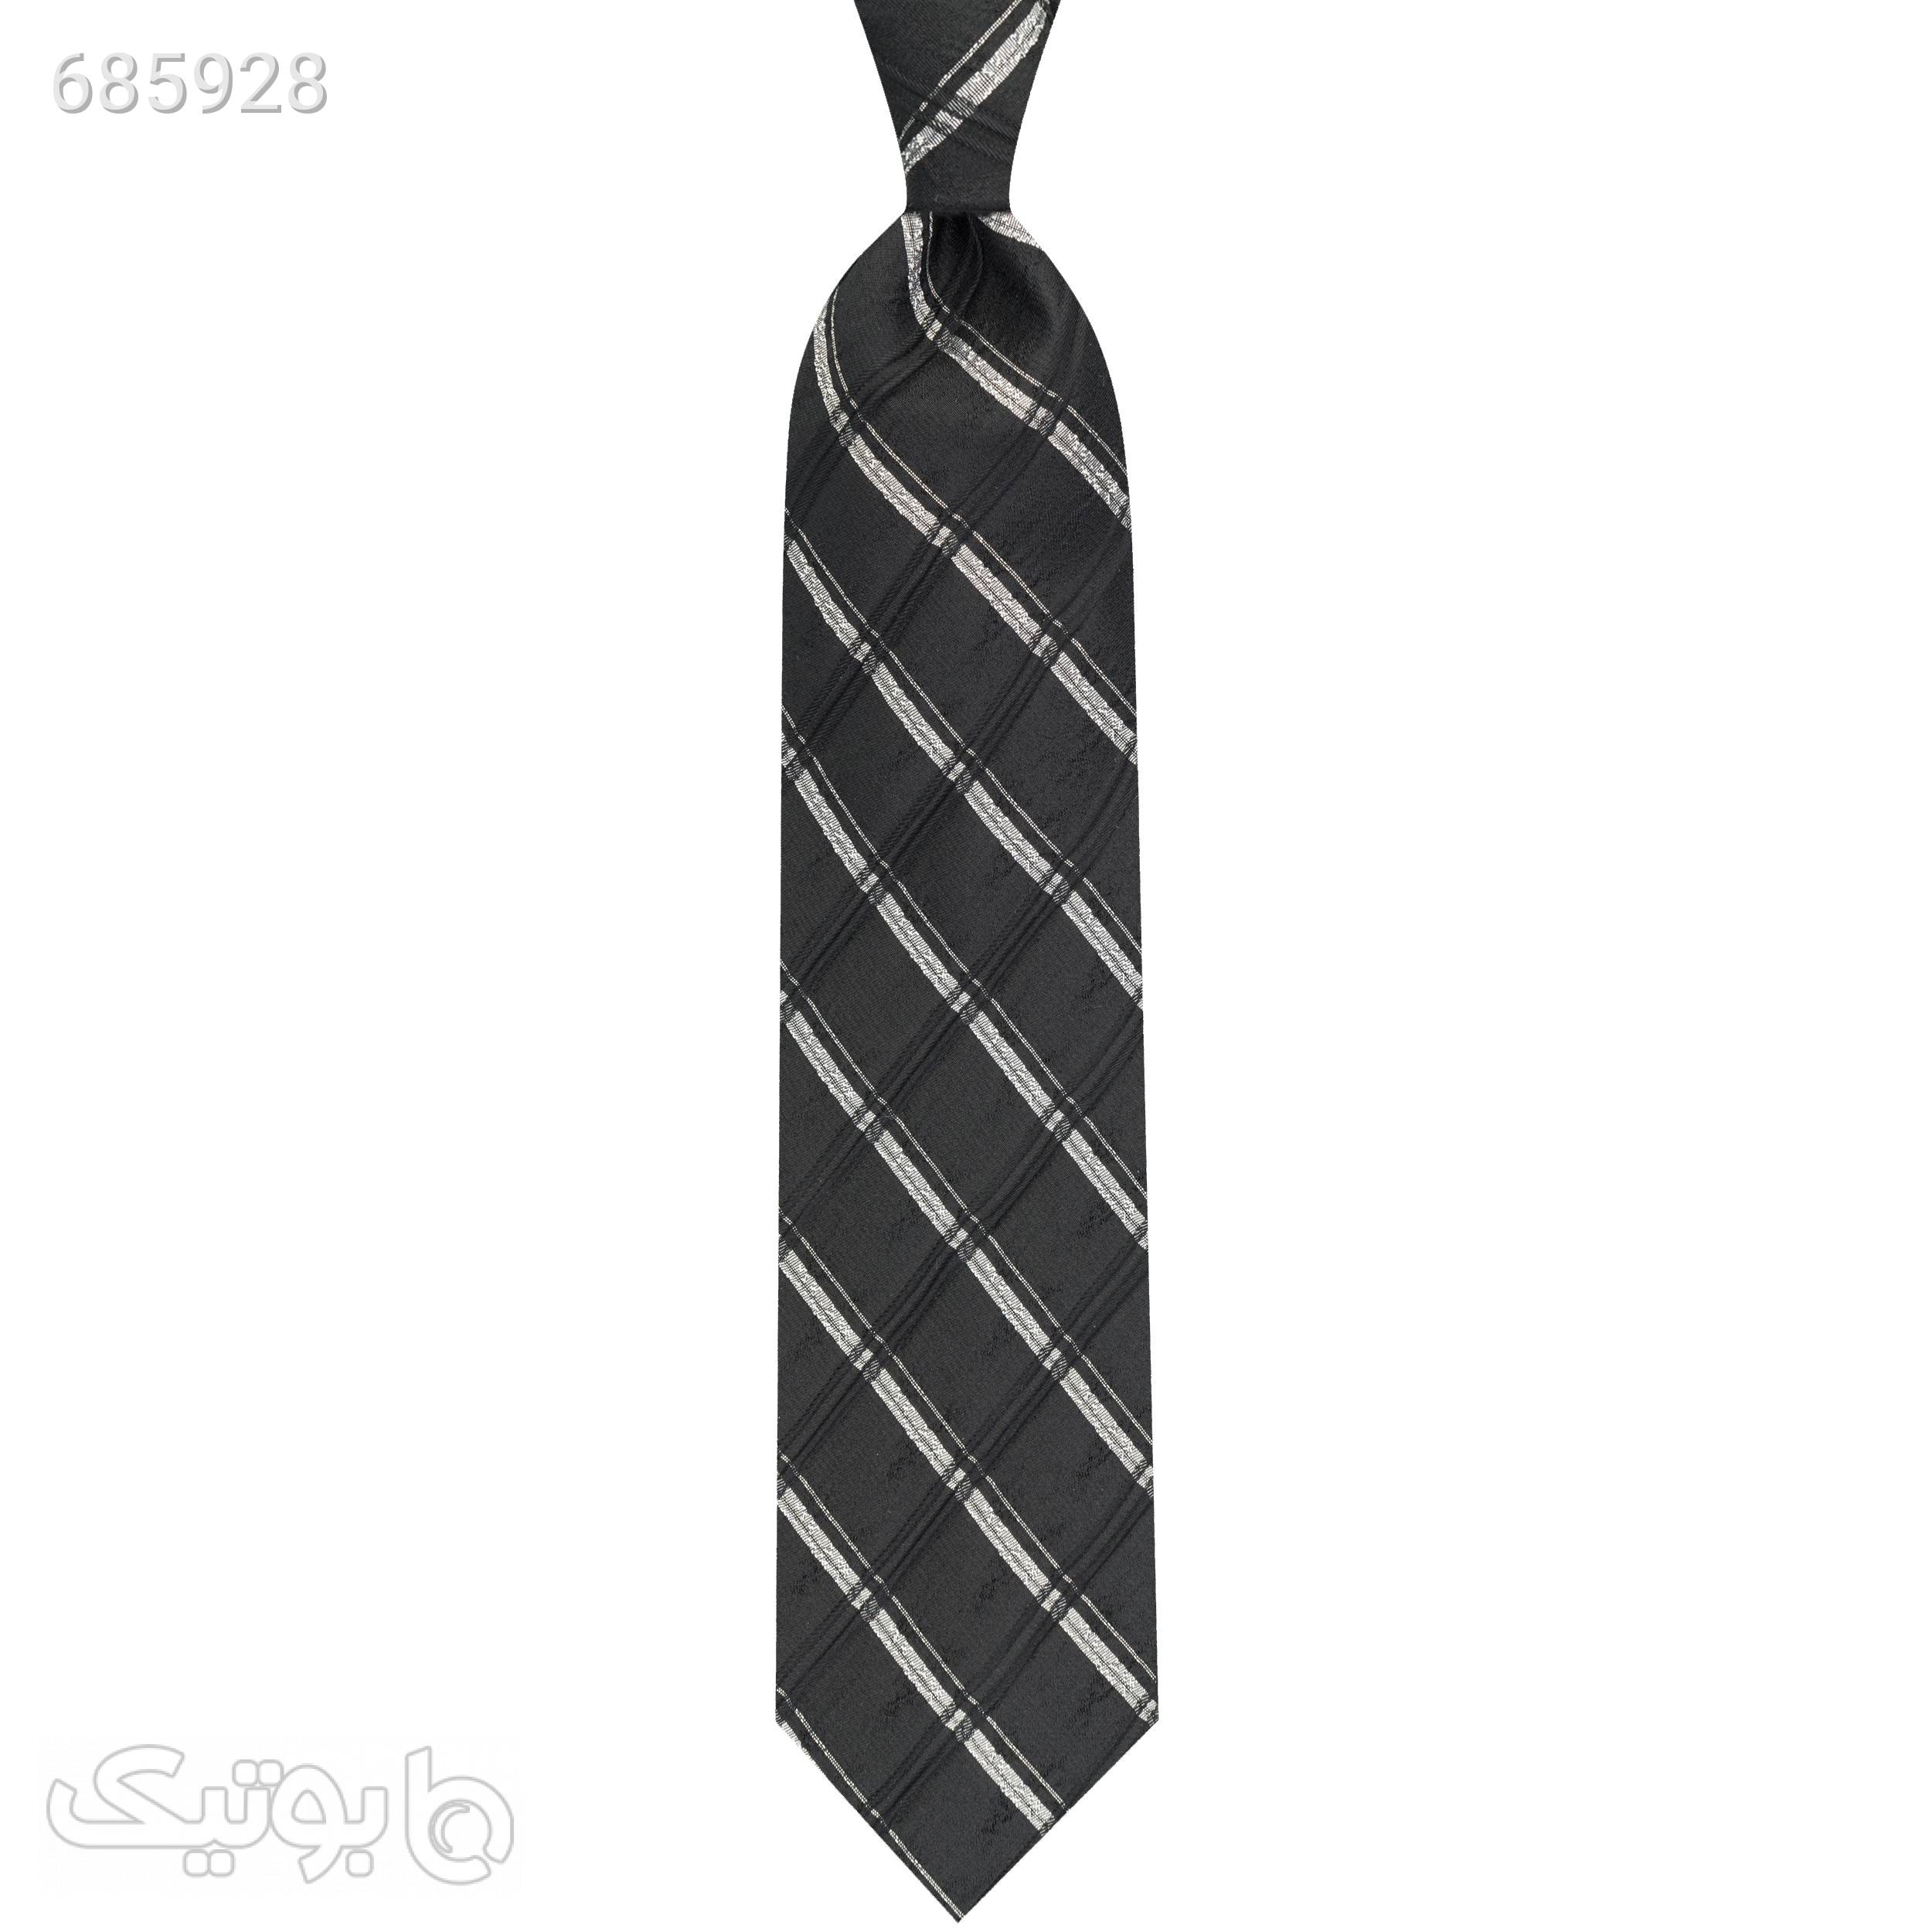 کراوات مردانه جیان فرانکو روسی مدل GFST533BK مشکی كراوات و پاپيون